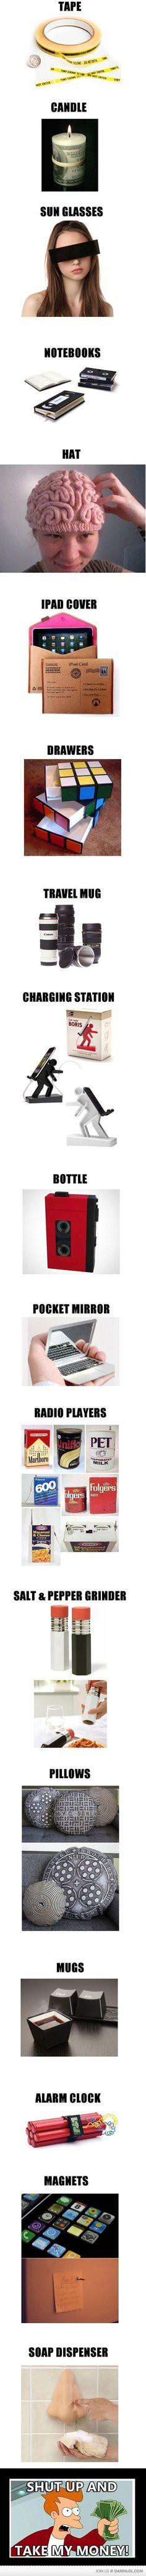 product, alarm clocks, stuff, gadget, sunglass, funni, random, awesom, thing